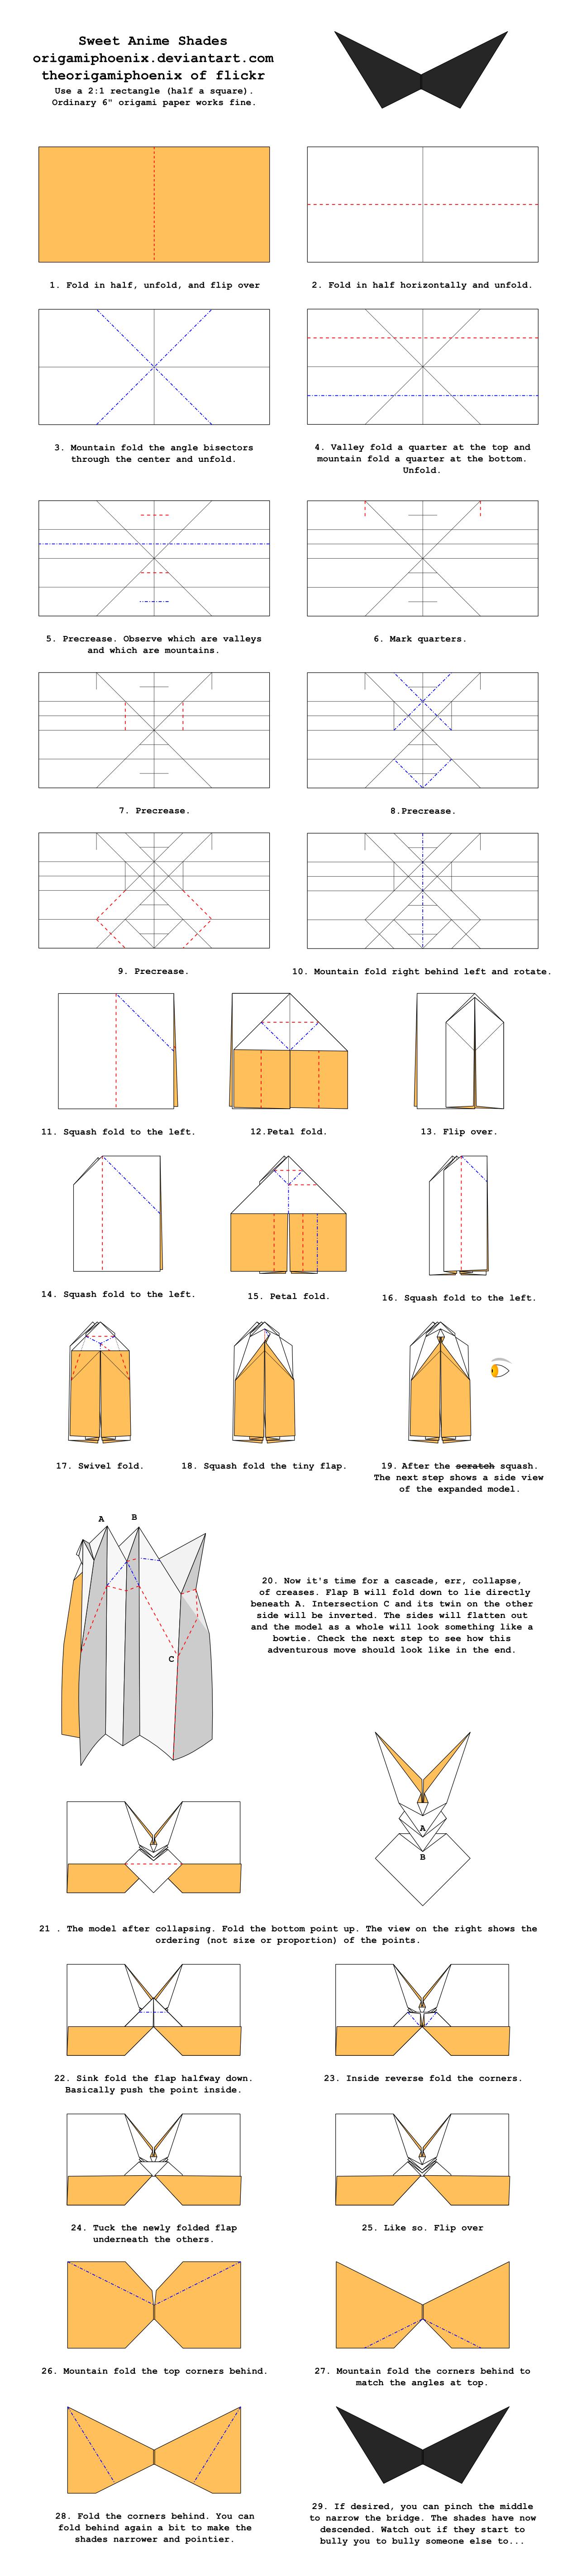 origami jeremy shafer choice image handicraft ideas home decorating rh getafun info BARF Jeremy Shafer Jeremy Shafer Flasher